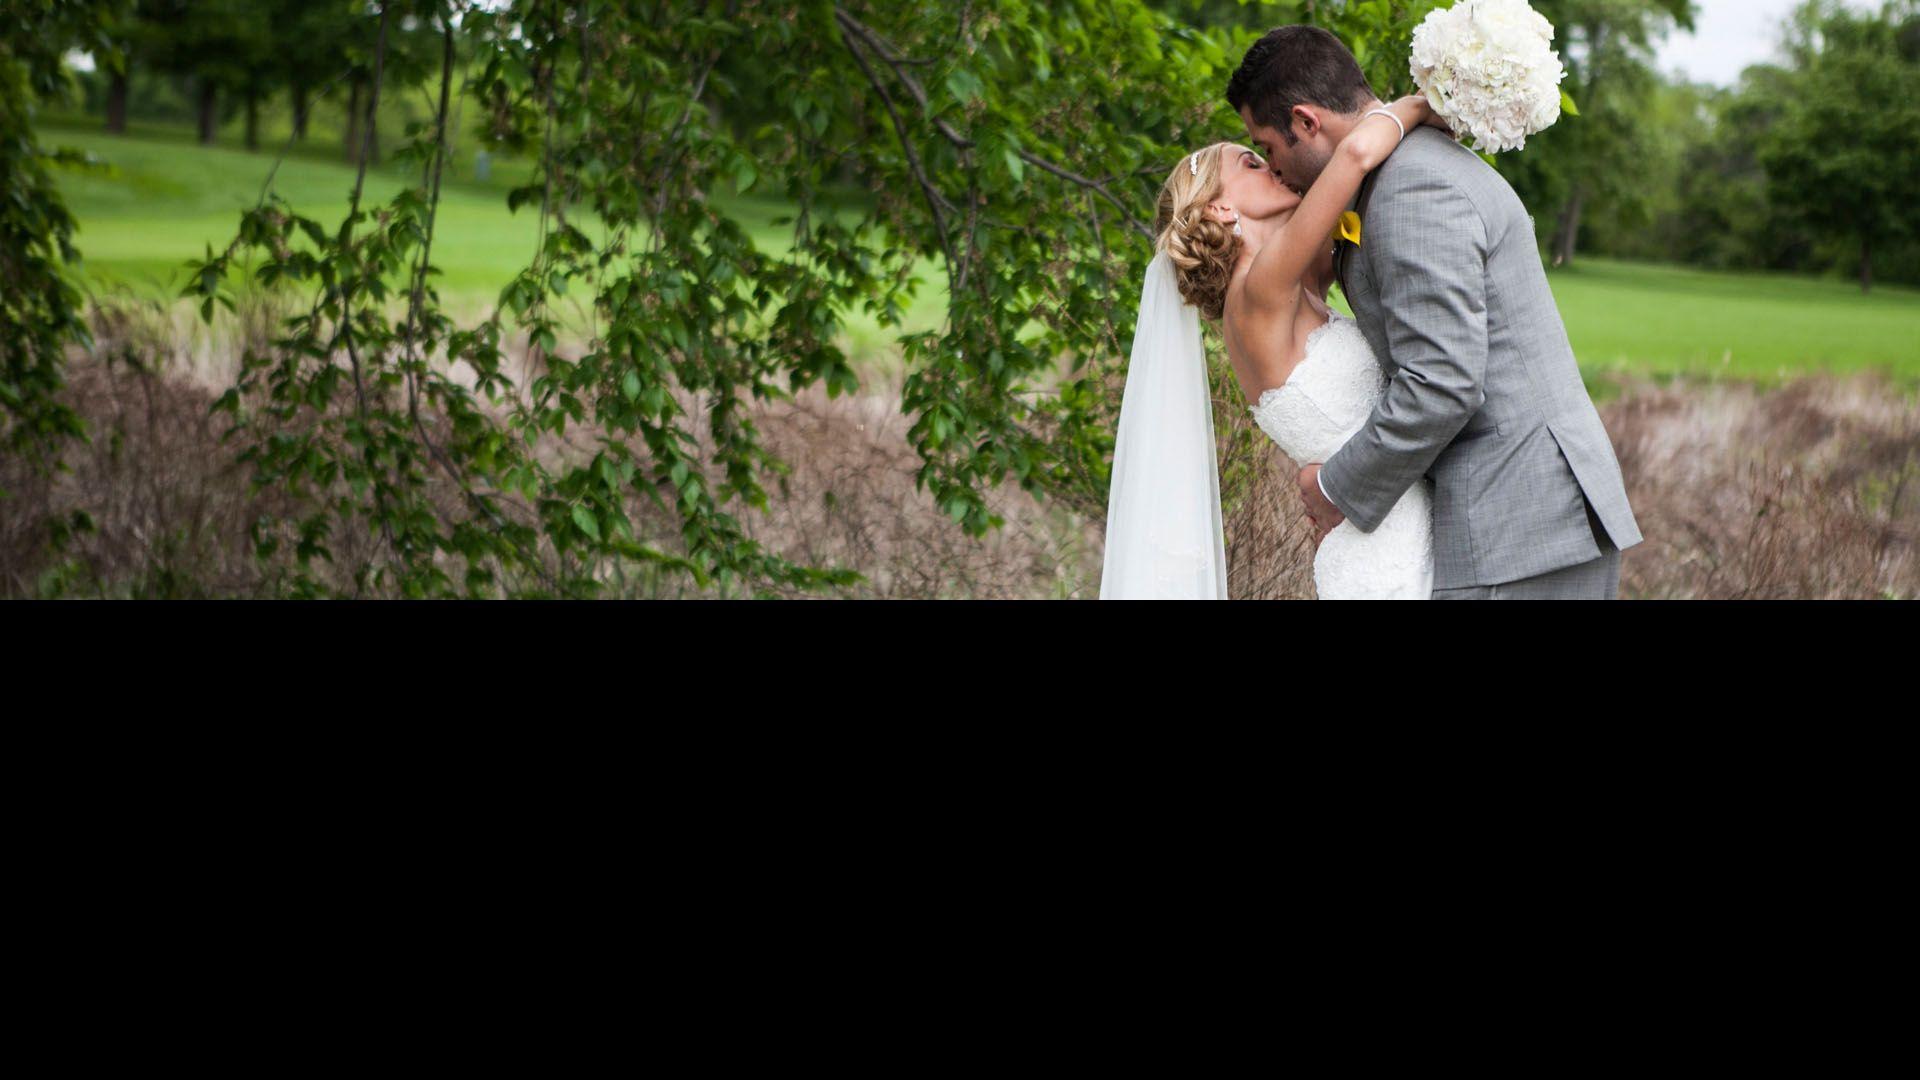 Country Club Wedding Venue MN | Weddings Minnesota | Outdoor Wedding Ceremony MN | Wedding Reception MN | Wedding Venue | Weddings Eden Prairie MN